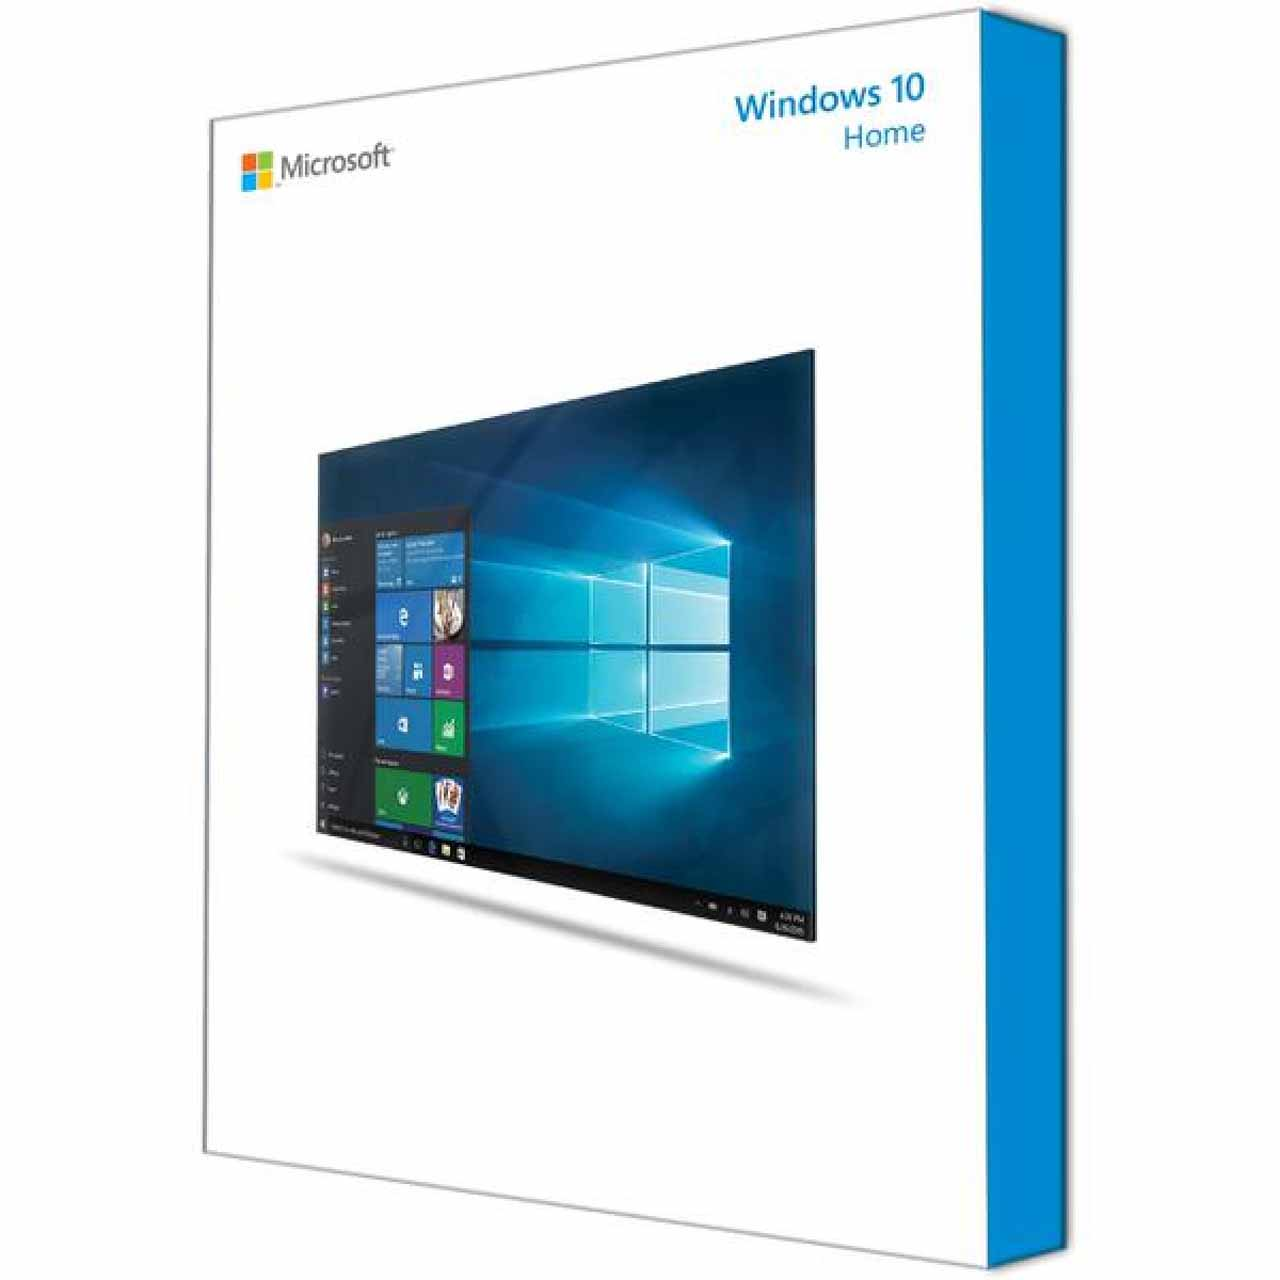 سیستم عامل ویندوز 10 نسخه Home - لایسنس OEM